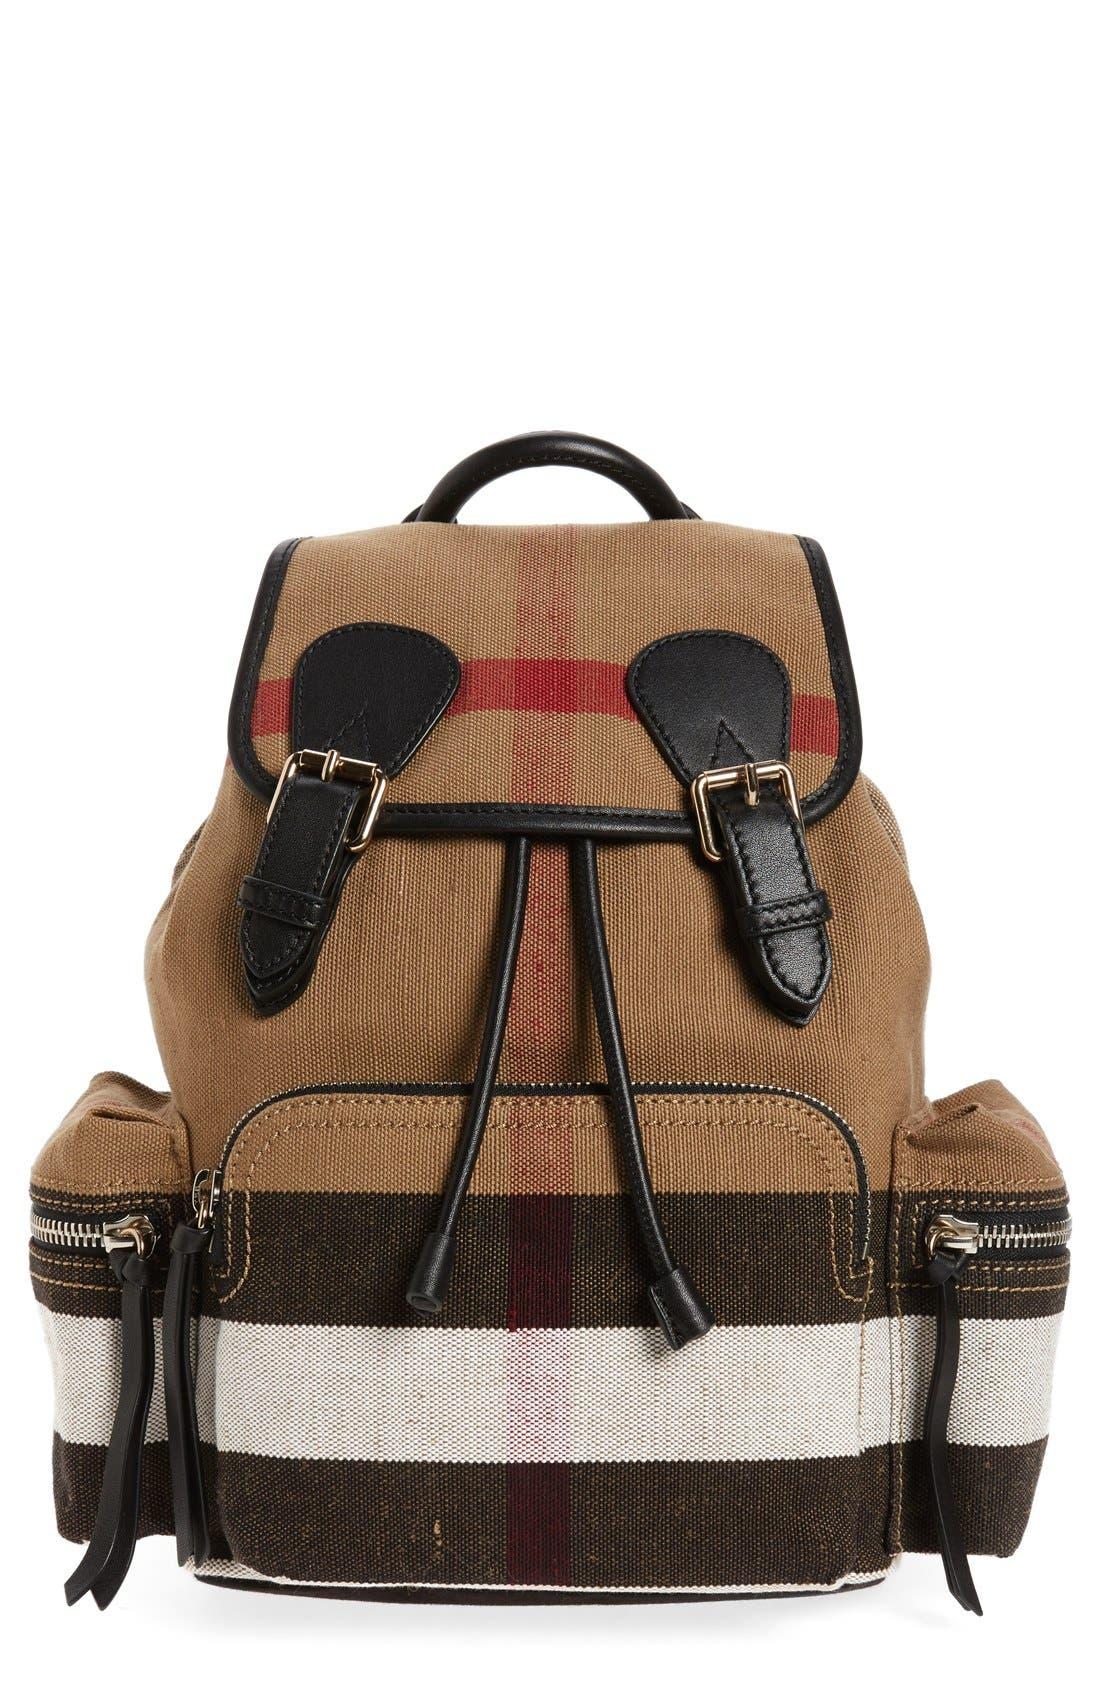 Burberry Medium Canvas Backpack